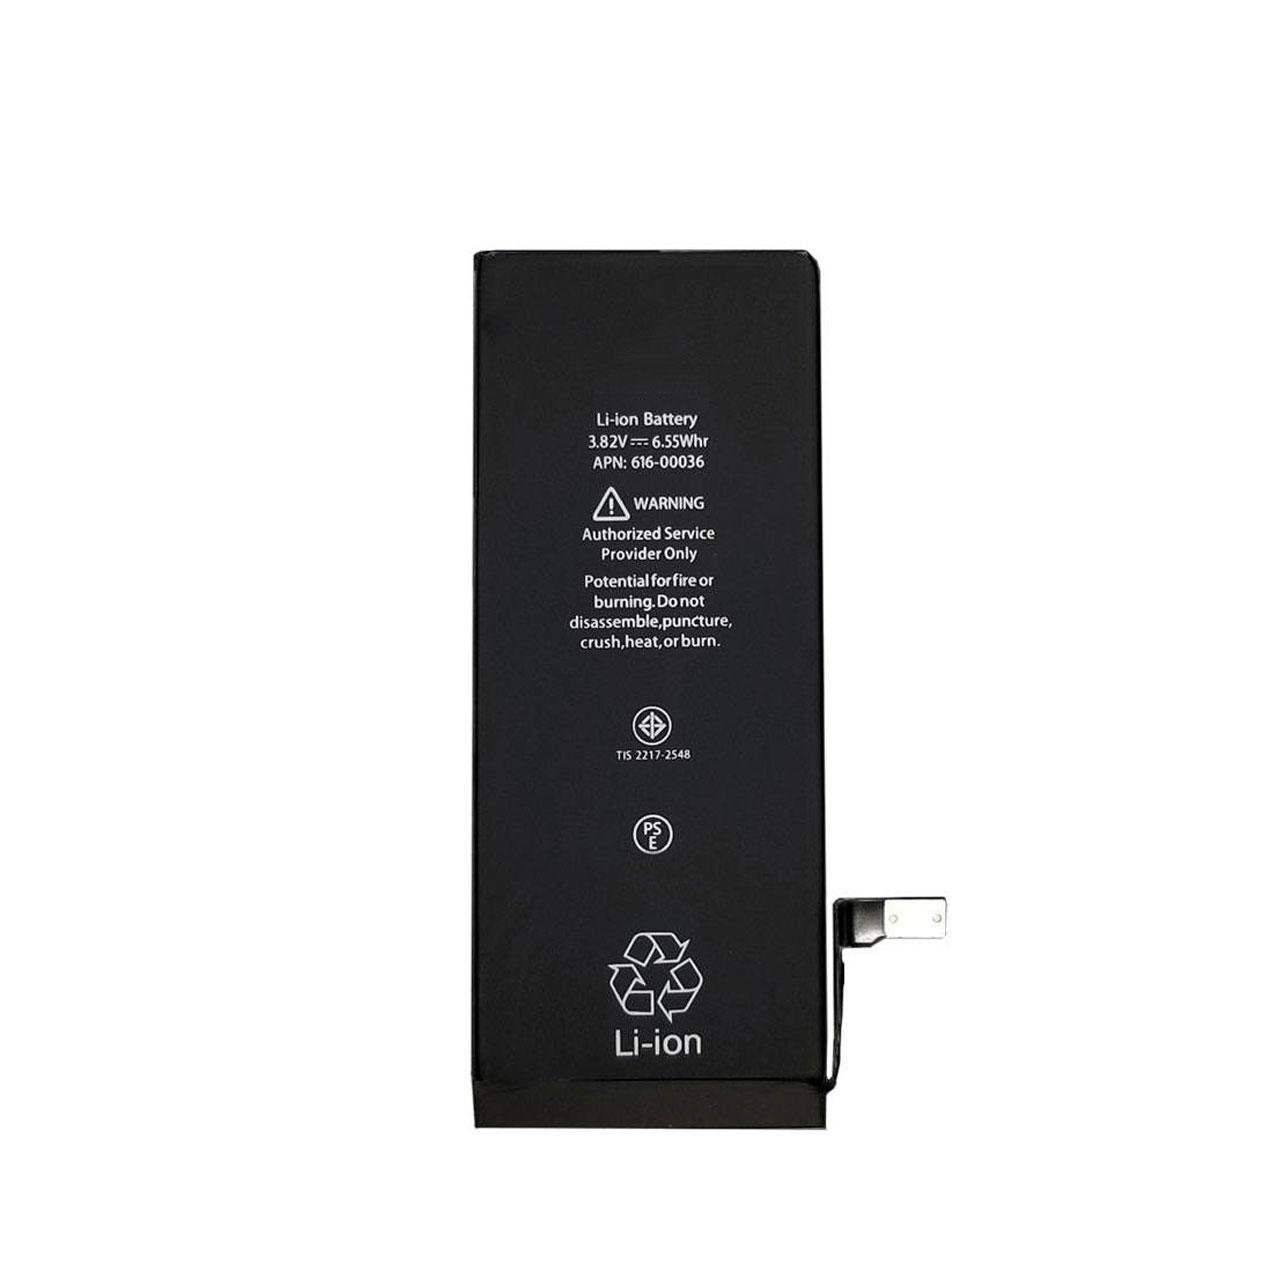 باتري موبايل مدل BTR ظرفیت 1821 میلی آمپر ساعت مناسب براي گوشي موبايل اپل iPhone 8